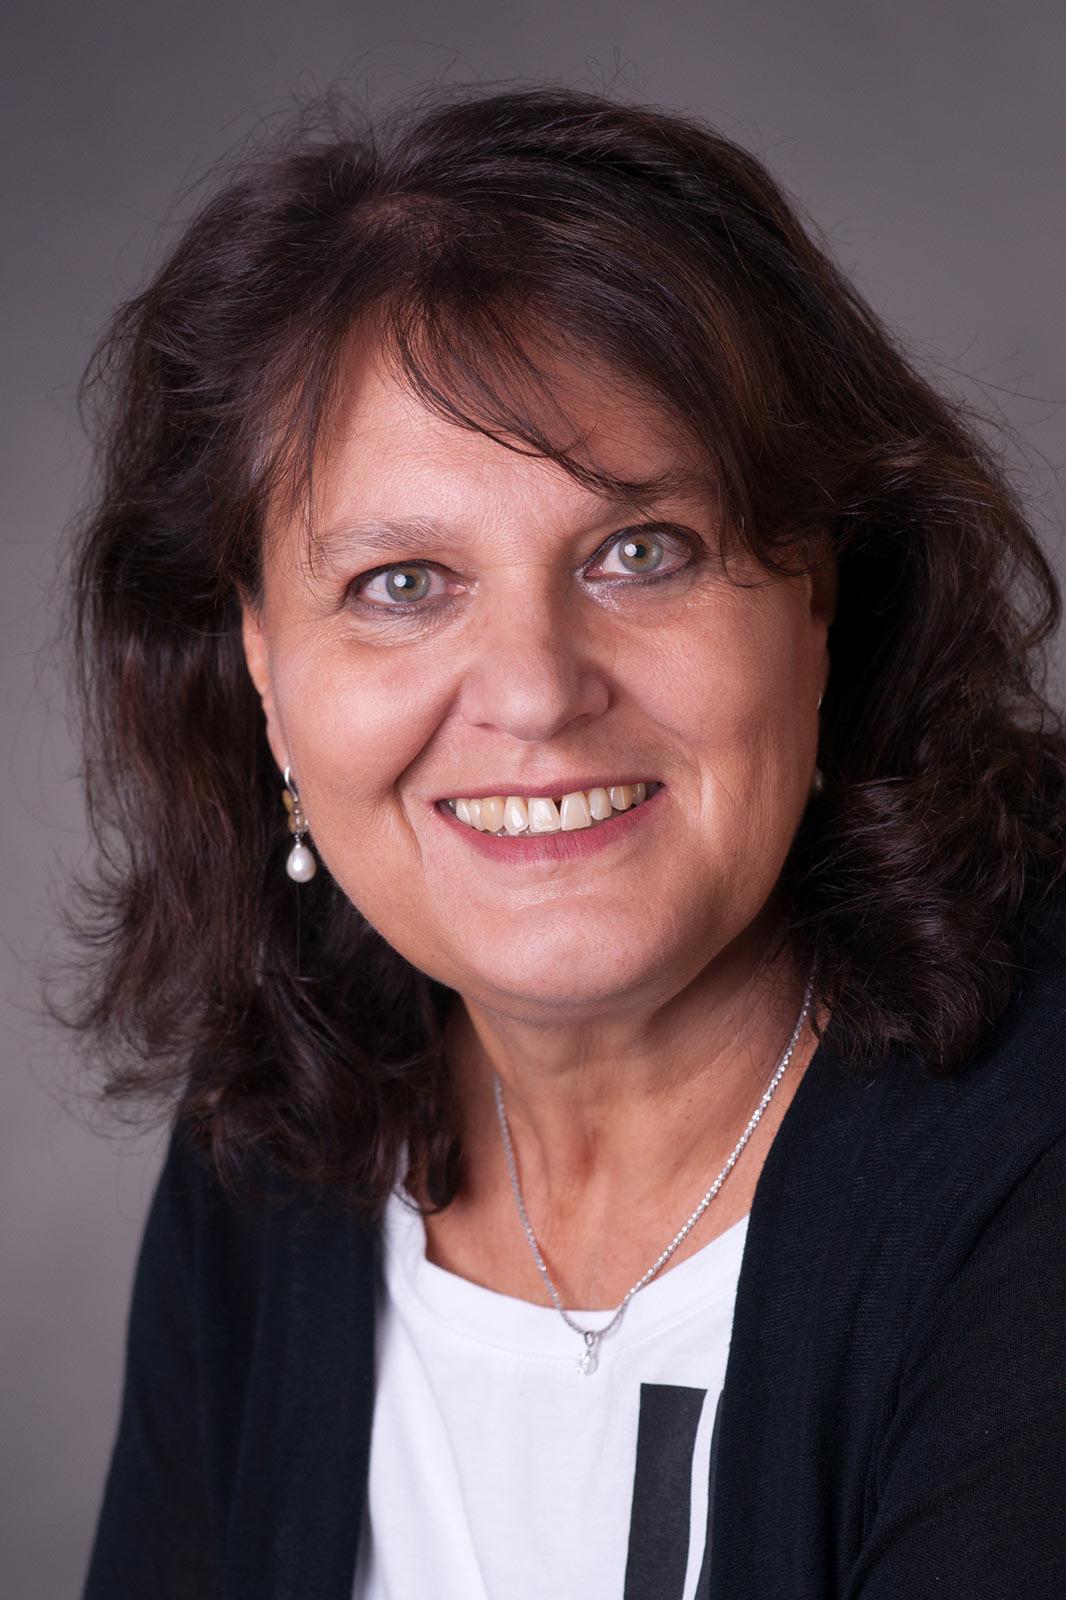 Brigitte Dombrowski - Reisebüro am Brunneck